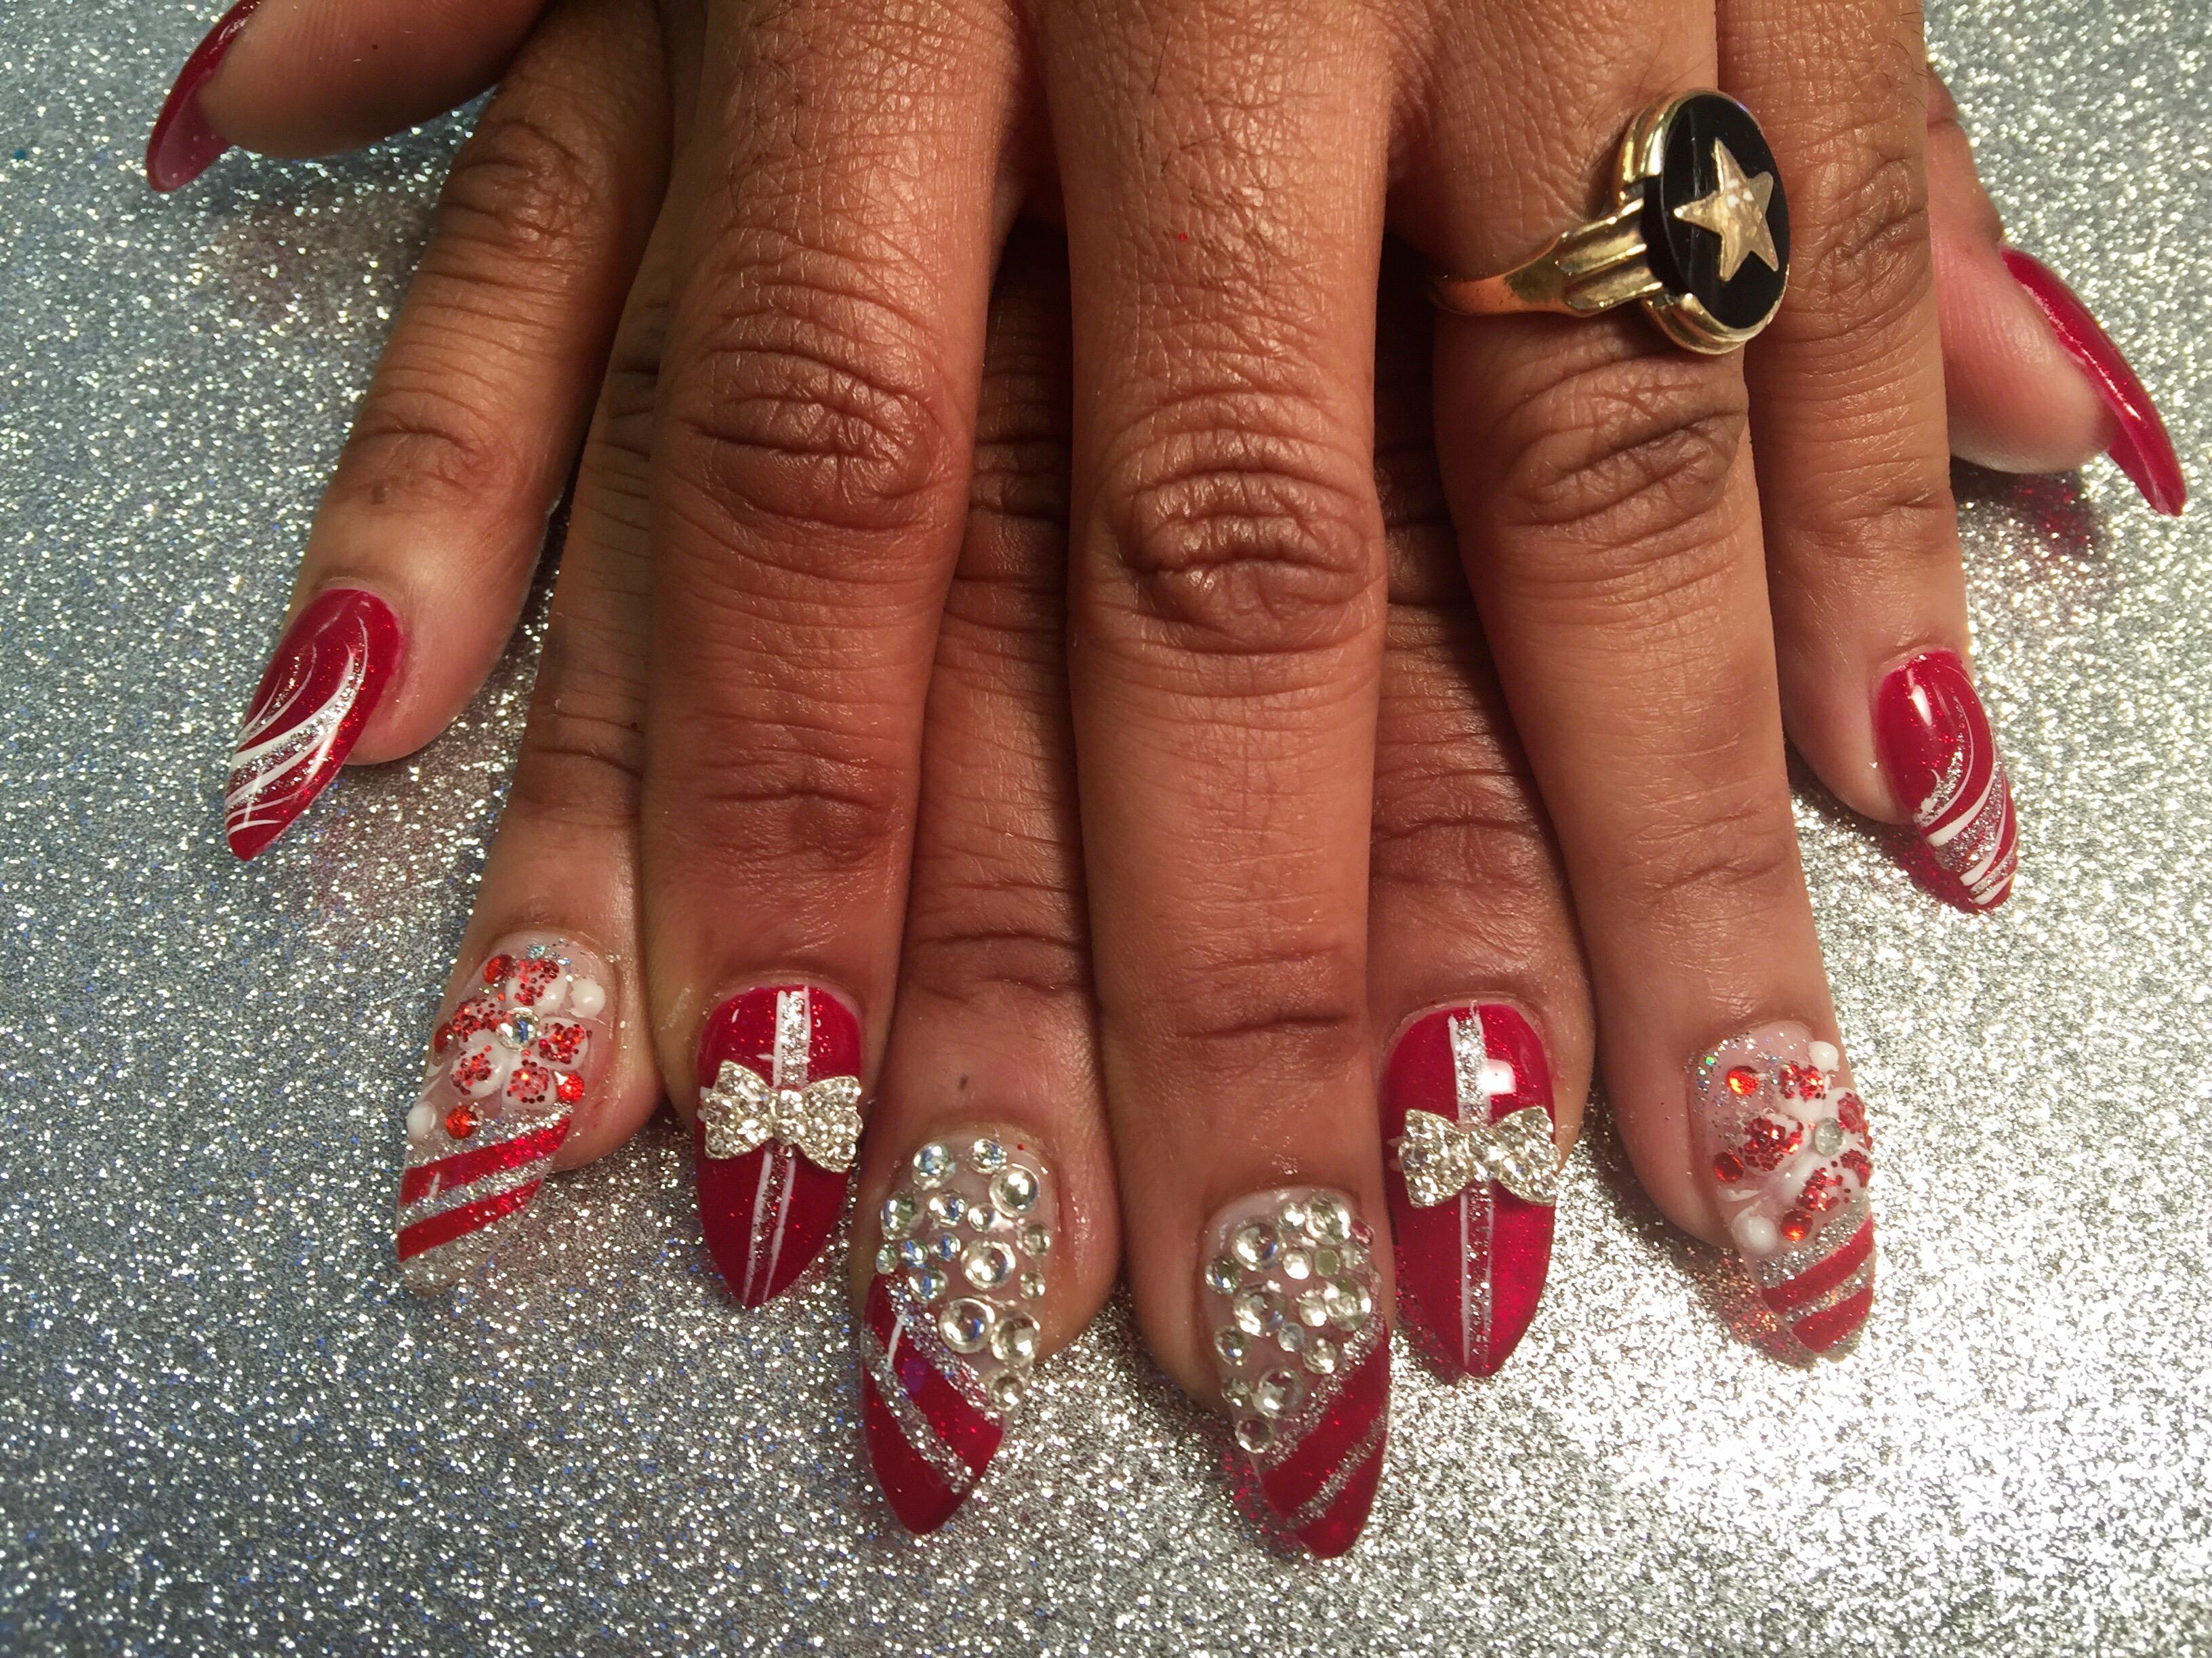 Sparkling christmas presents nail art designs by top nails sparkling christmas presents nail art designs by top nails clarksville tn prinsesfo Gallery